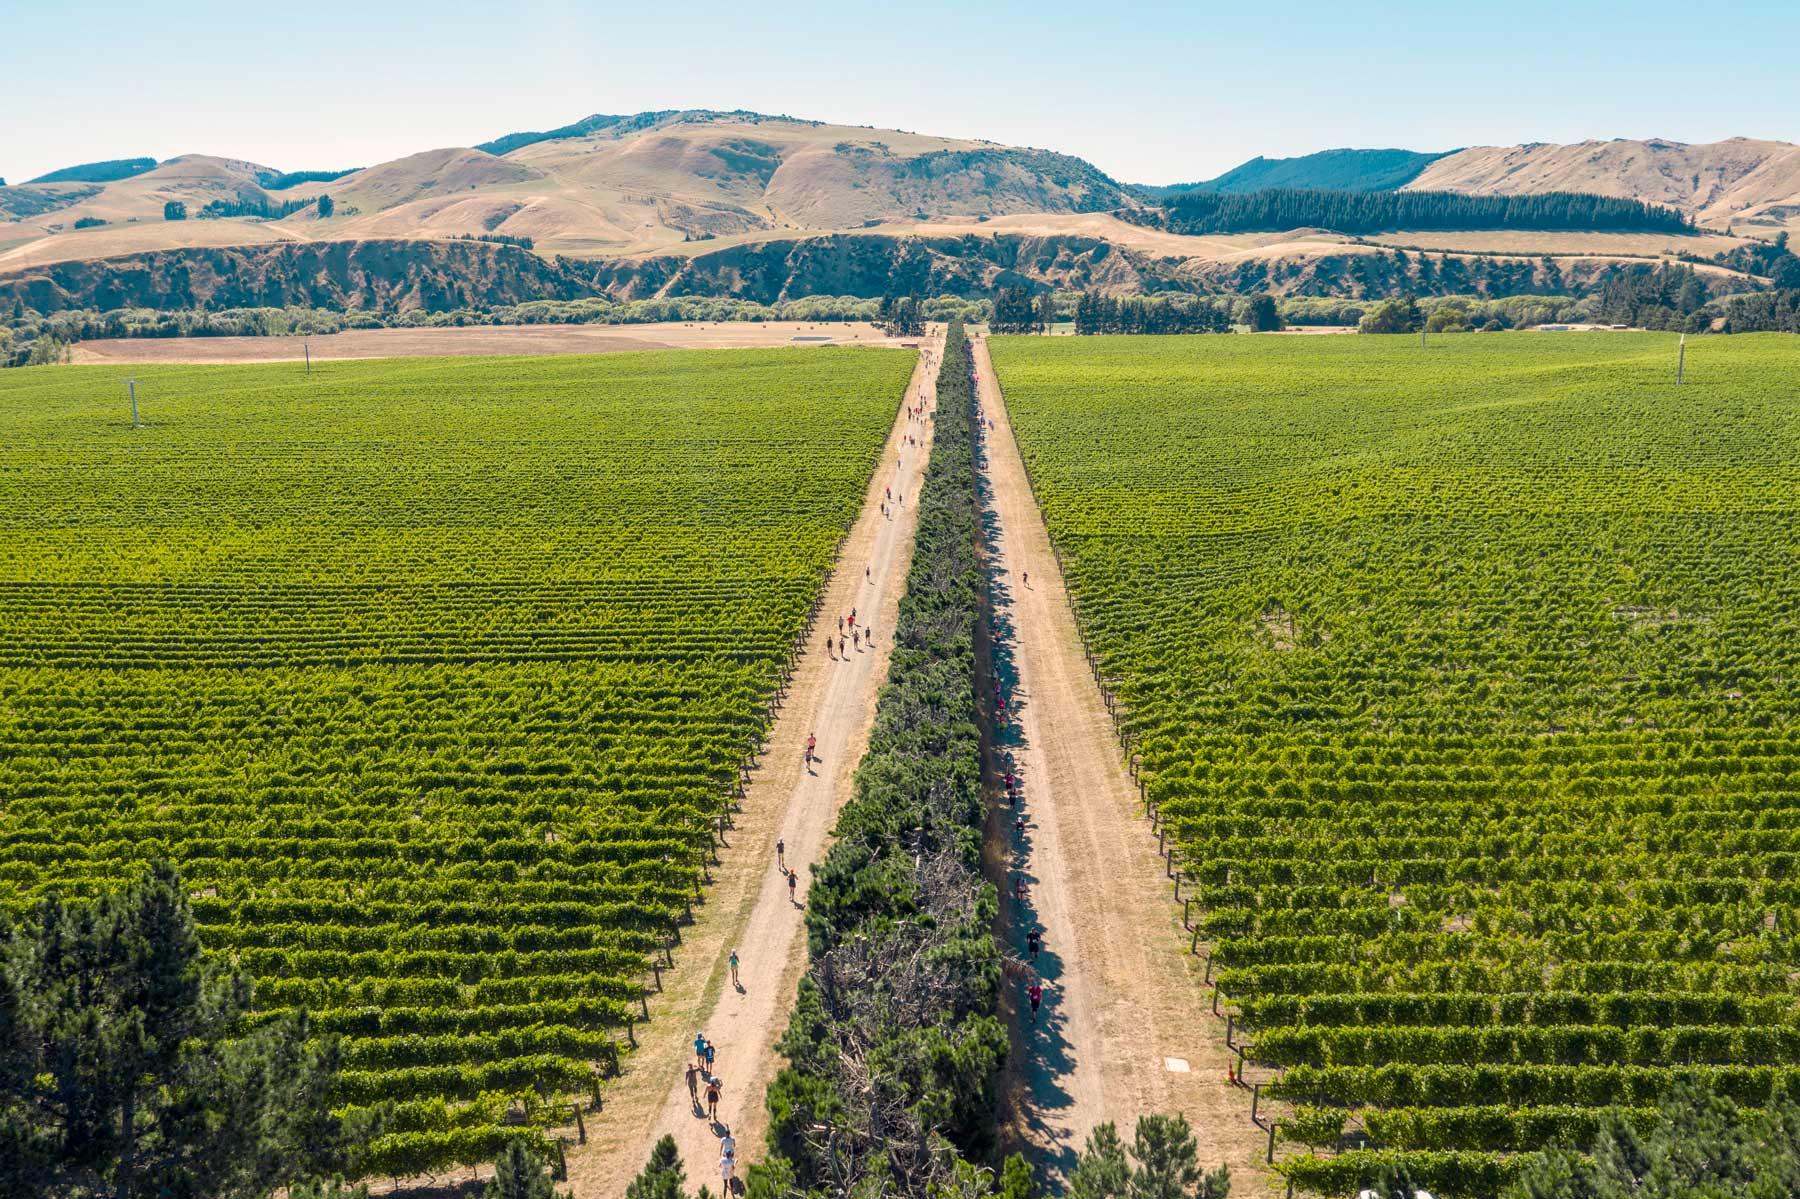 vine-run-aerial-2019.jpg